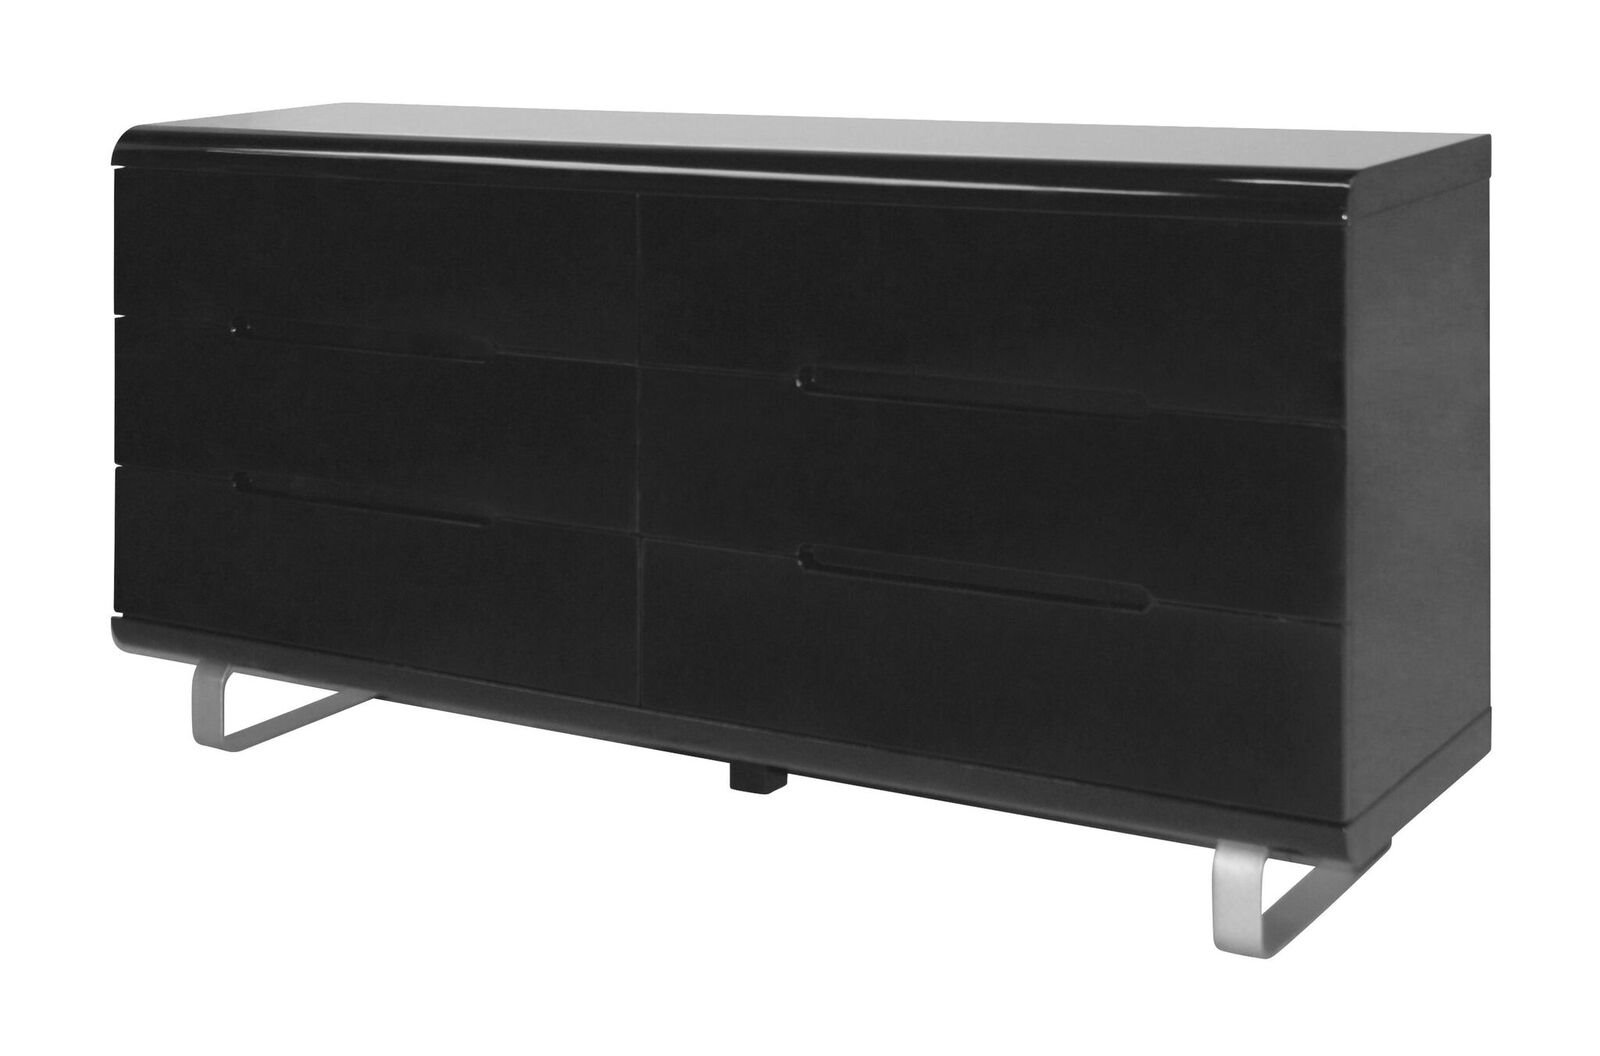 kommode spacy hochglanz schwarz sideboard schubladen. Black Bedroom Furniture Sets. Home Design Ideas